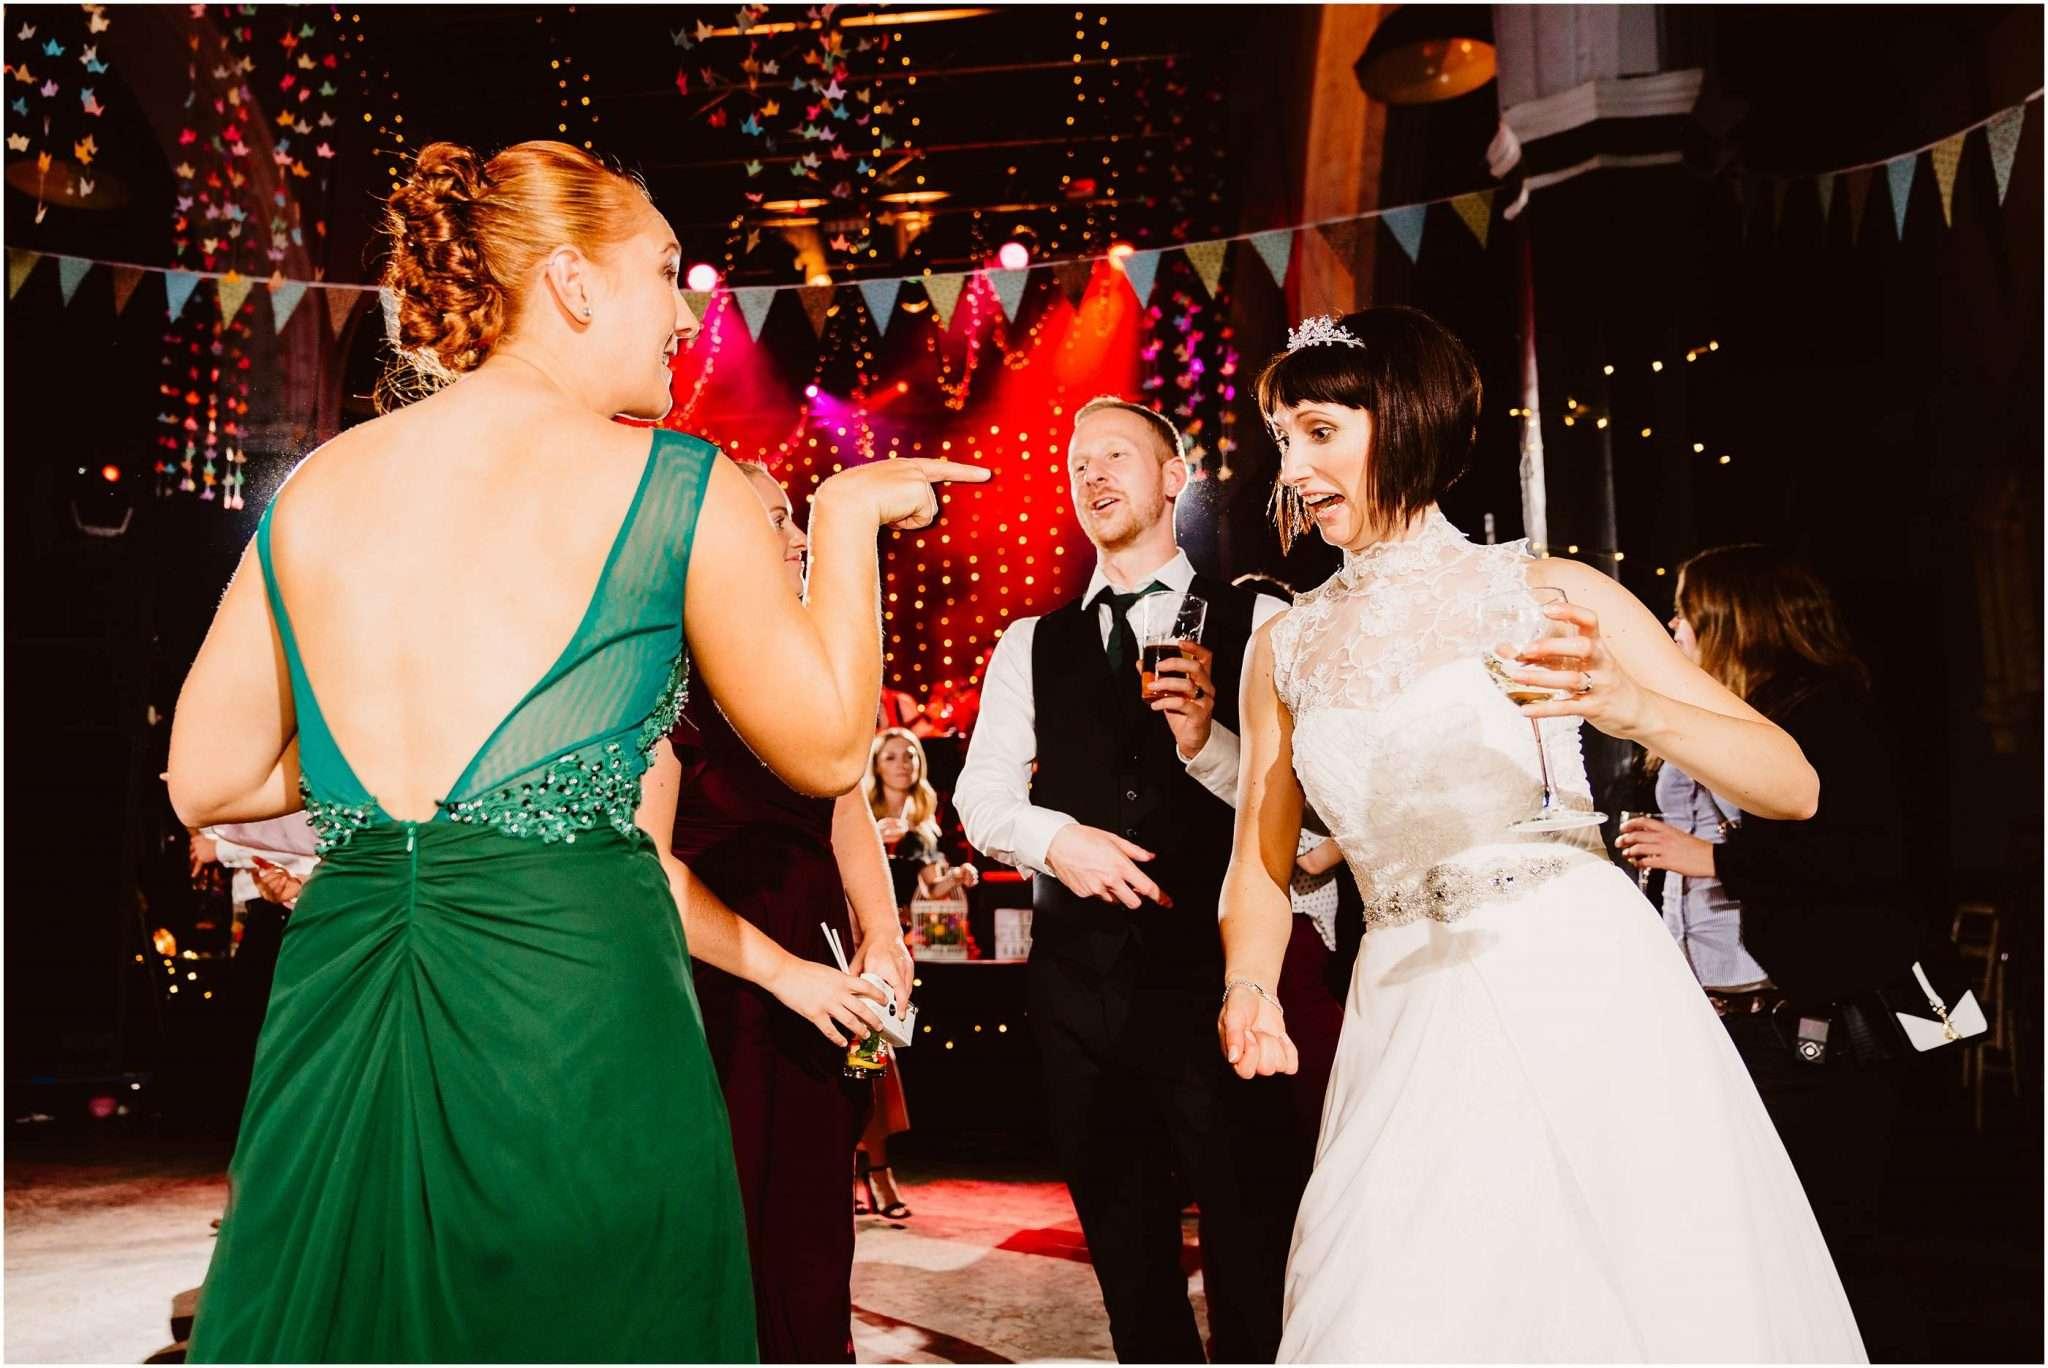 BERNIE & JAMES' STRANGERS HALL AND NORWICH ARTS CENTRE WEDDING